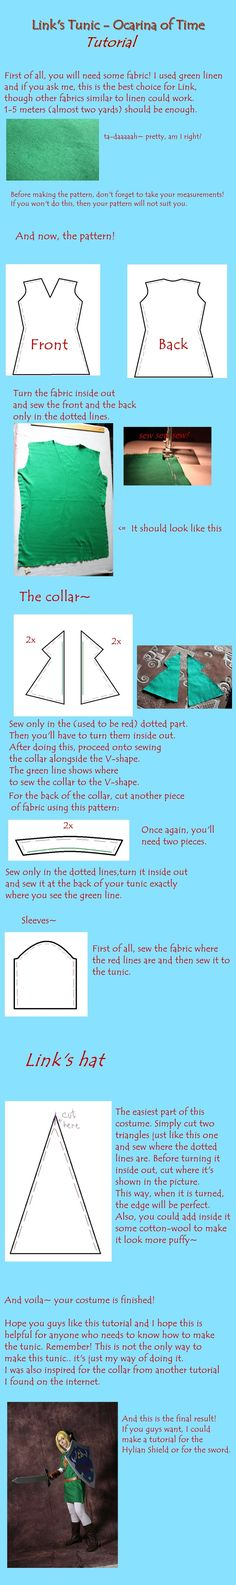 Link tunic tutorial - Ocarina of Time by *mitsuhidezura on deviantART